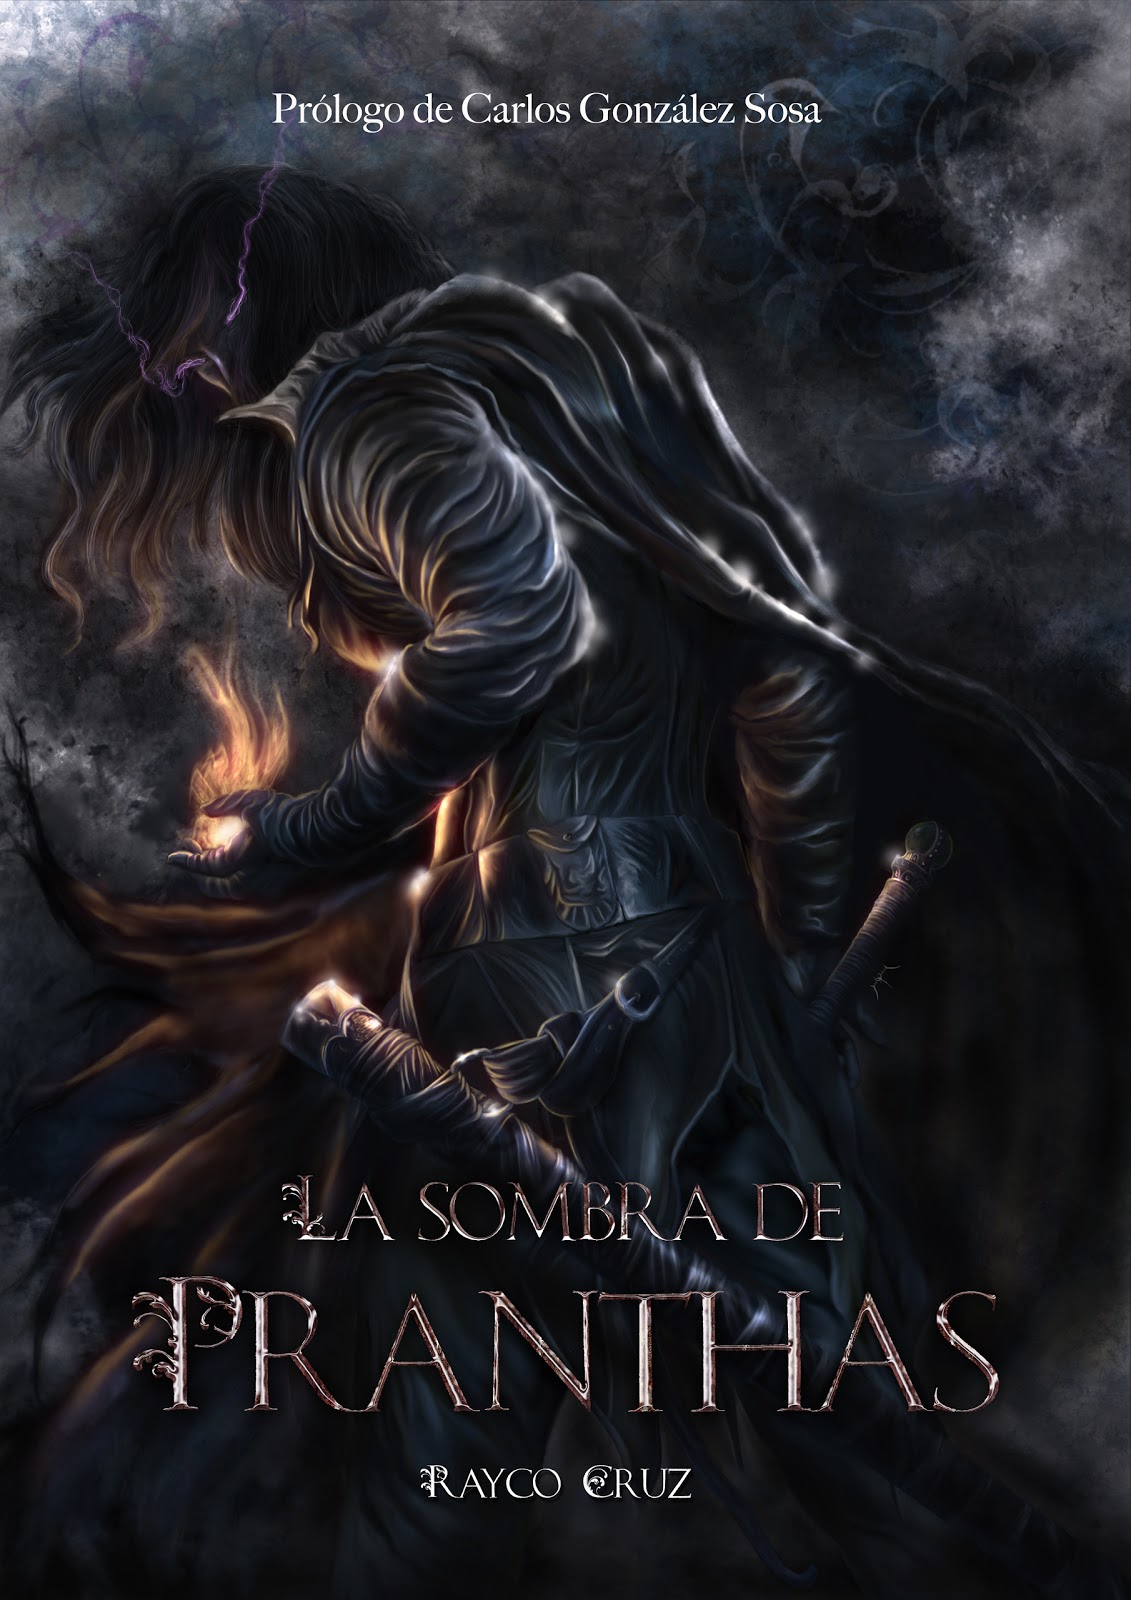 'La sombra de Pranthas'